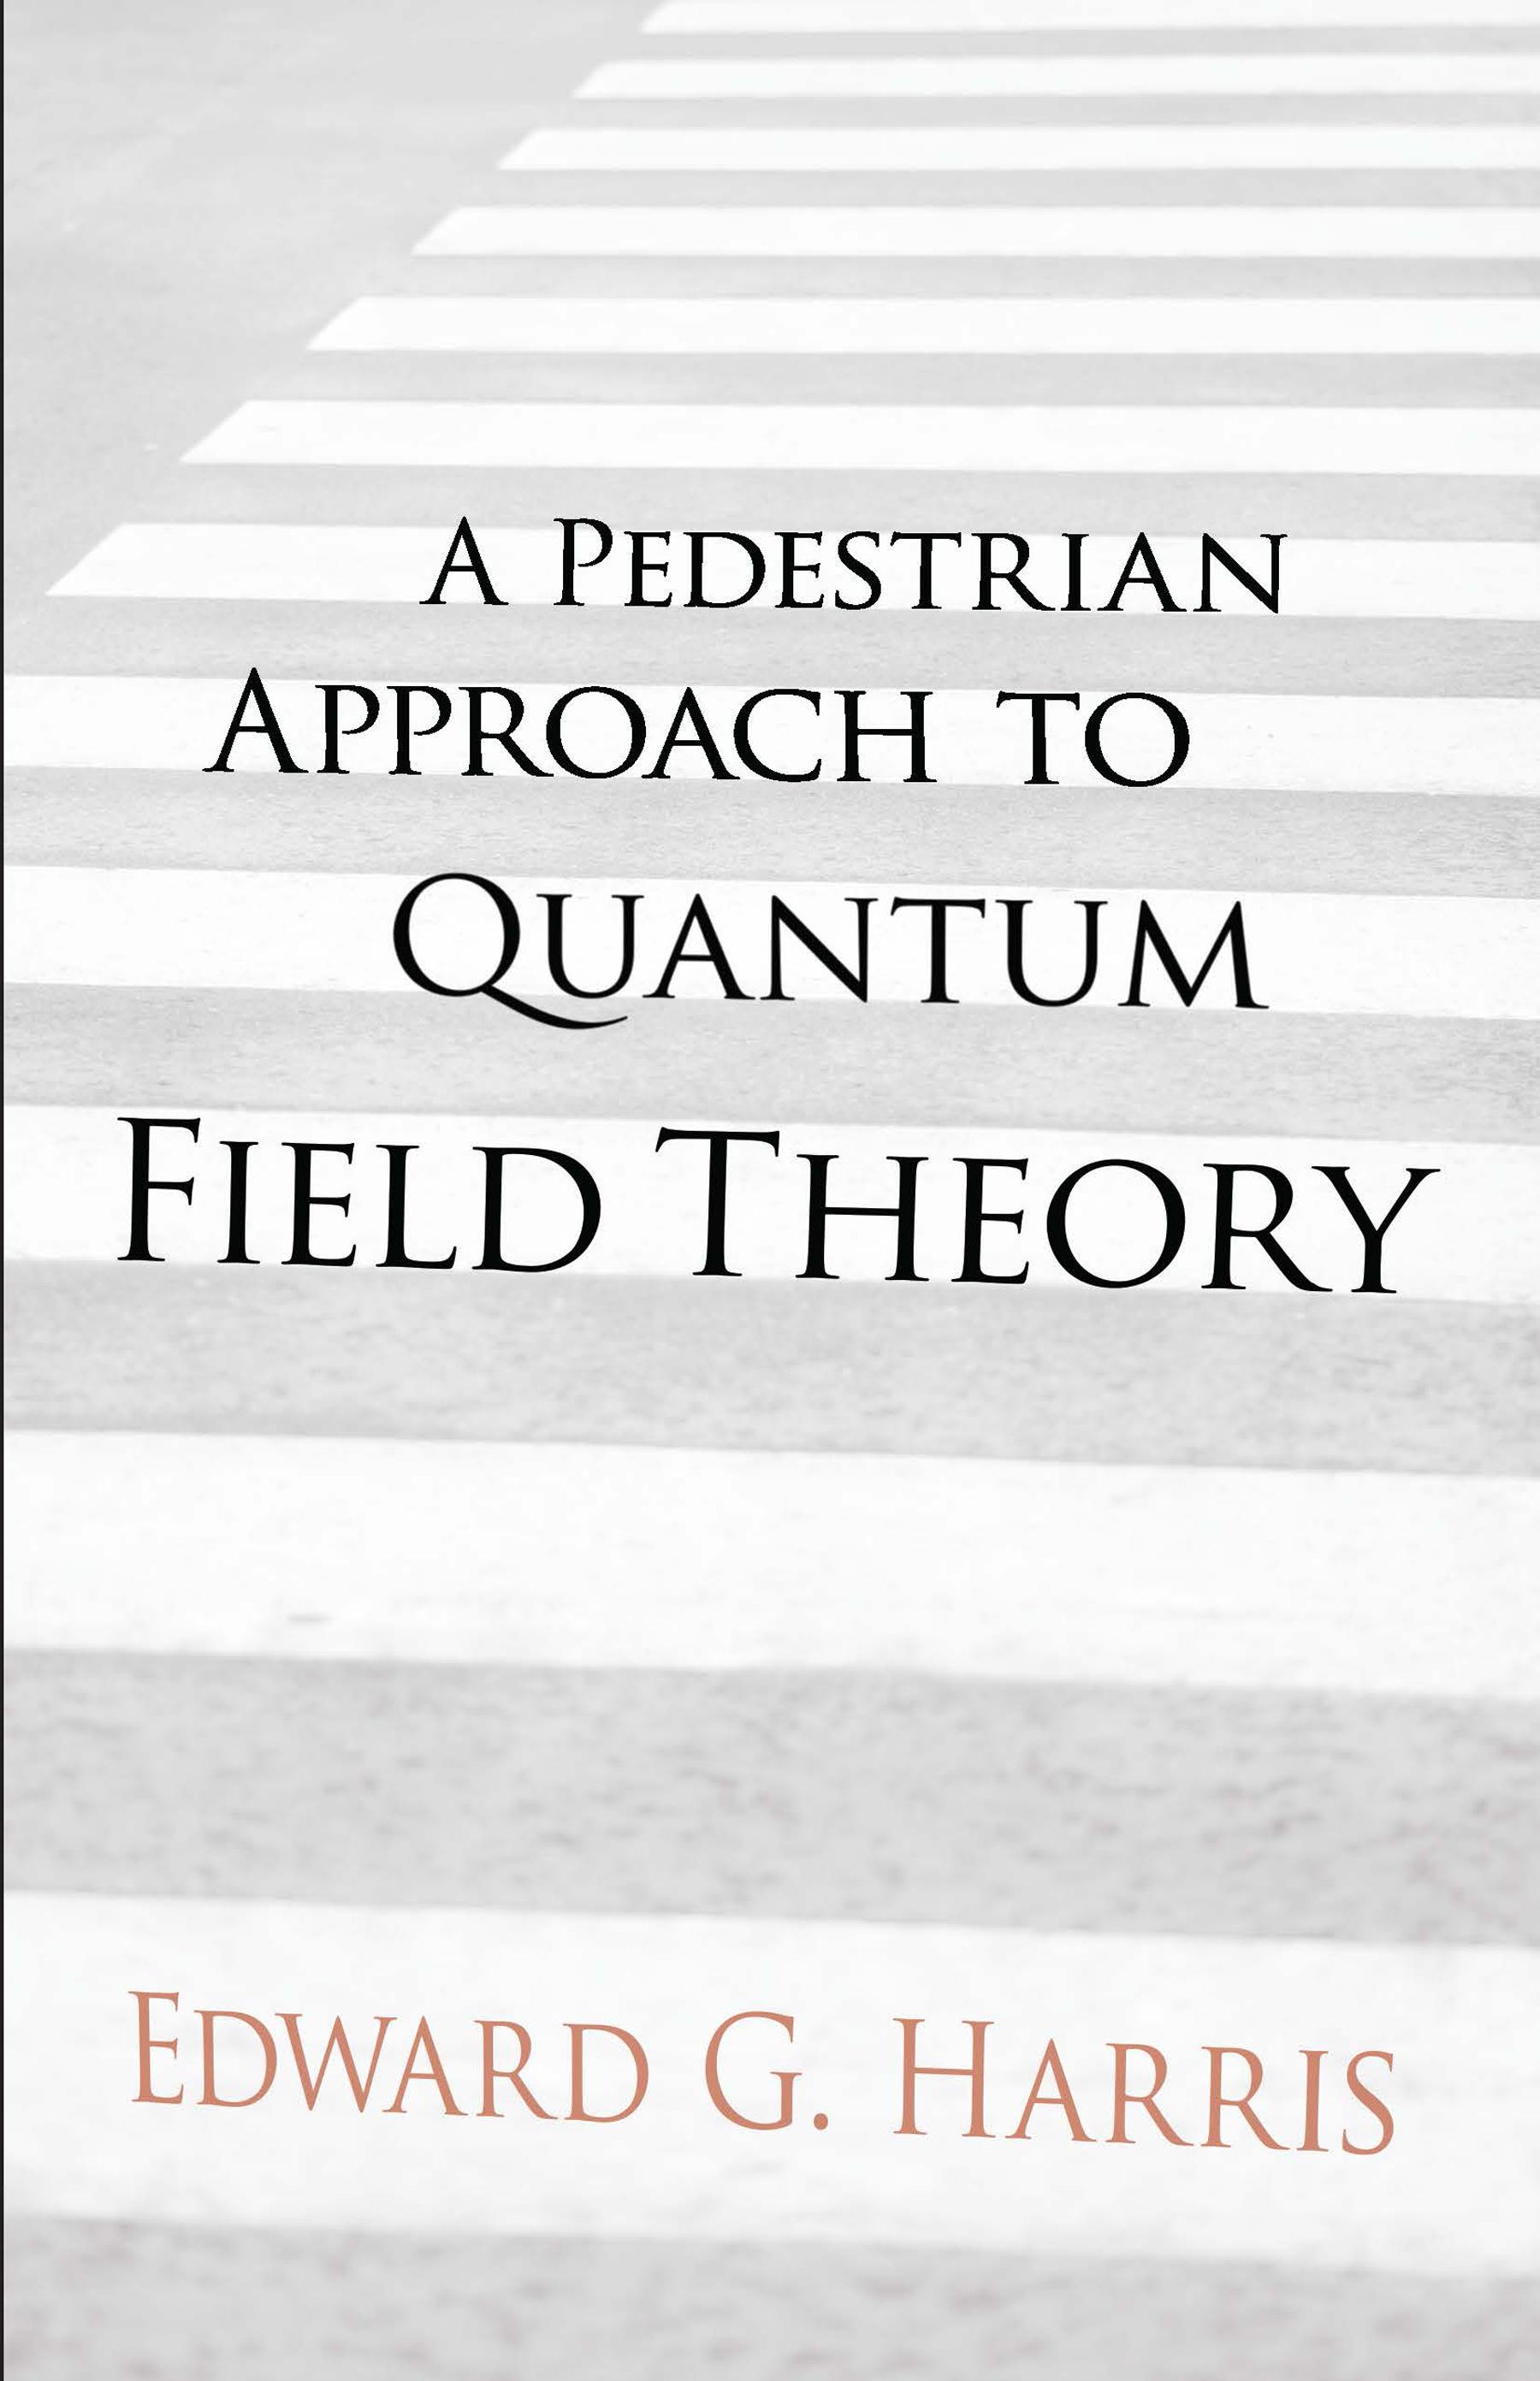 A Pedestrian Approach to Quantum Field Theory by Edward G Harris